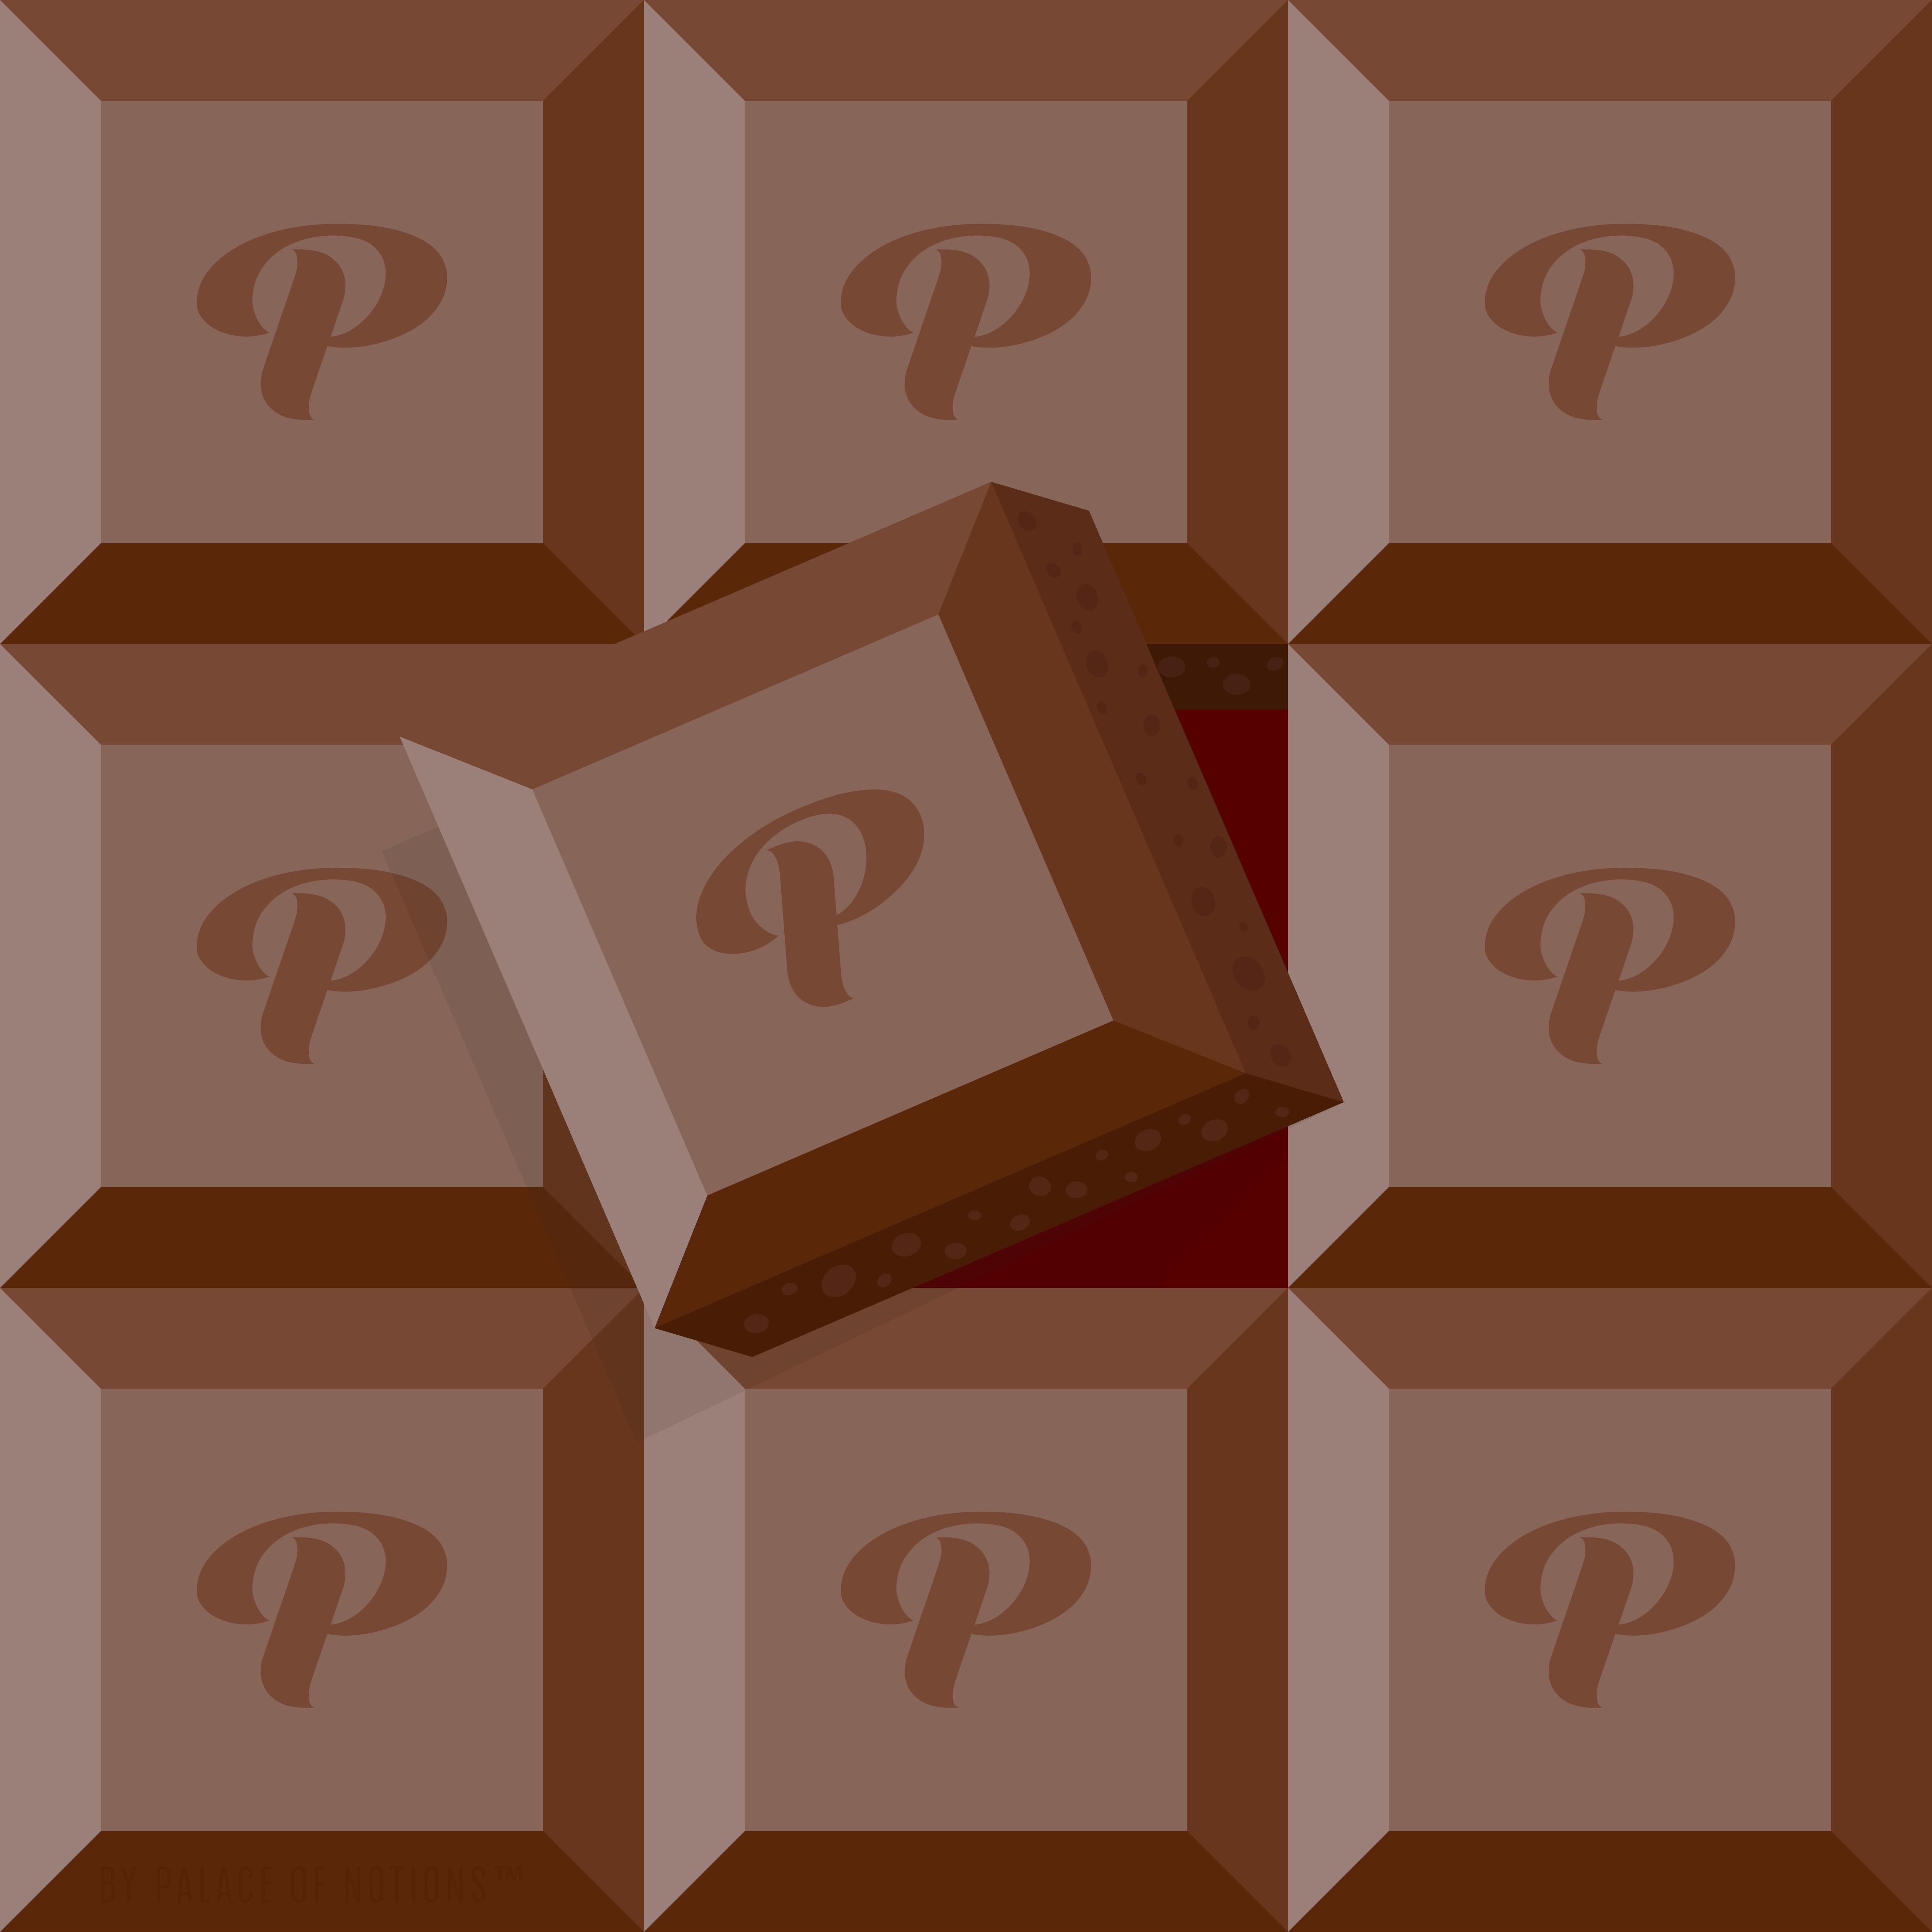 SQUARES-CHOCO-BIG